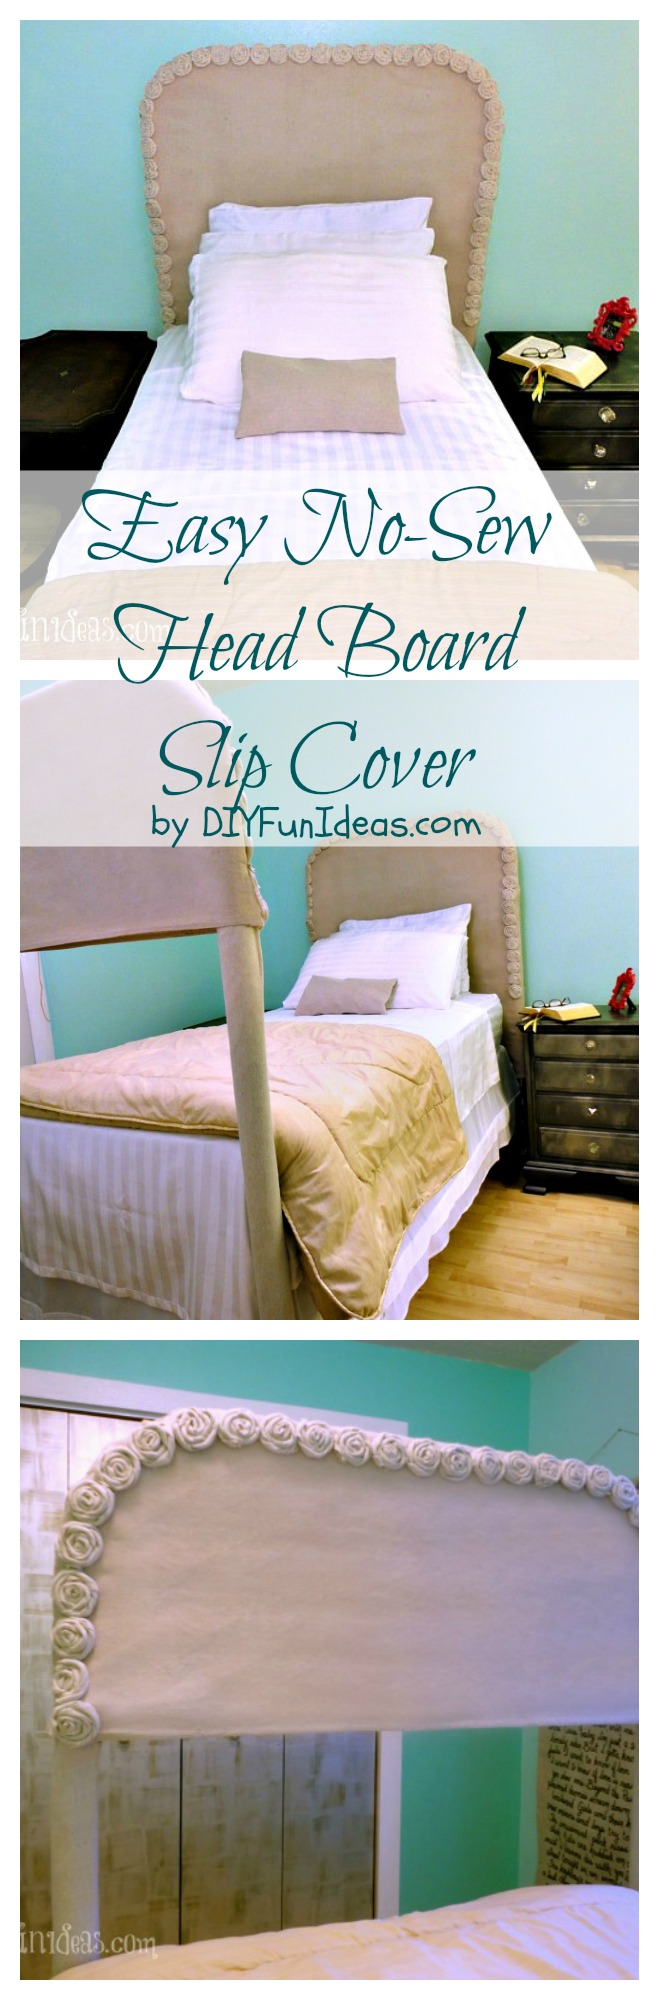 DIY No-sew drop cloth rosette headboard slip cover